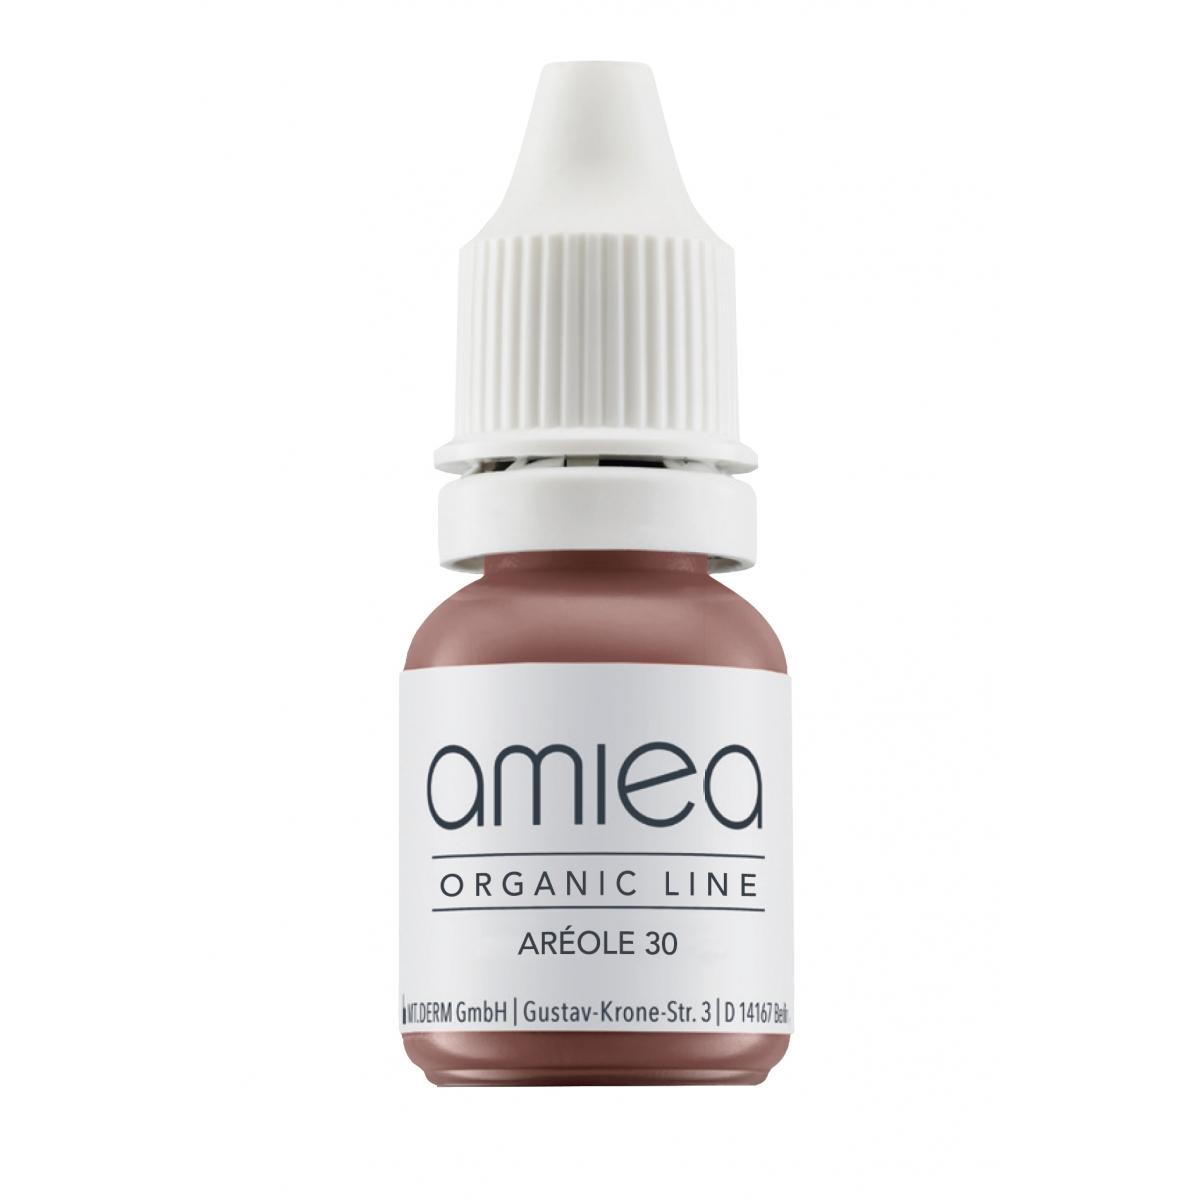 Organicline (10 ml) - PIGMENTS AMIEA ORGANICLINE AREOLES 30, Flacon 10 ml